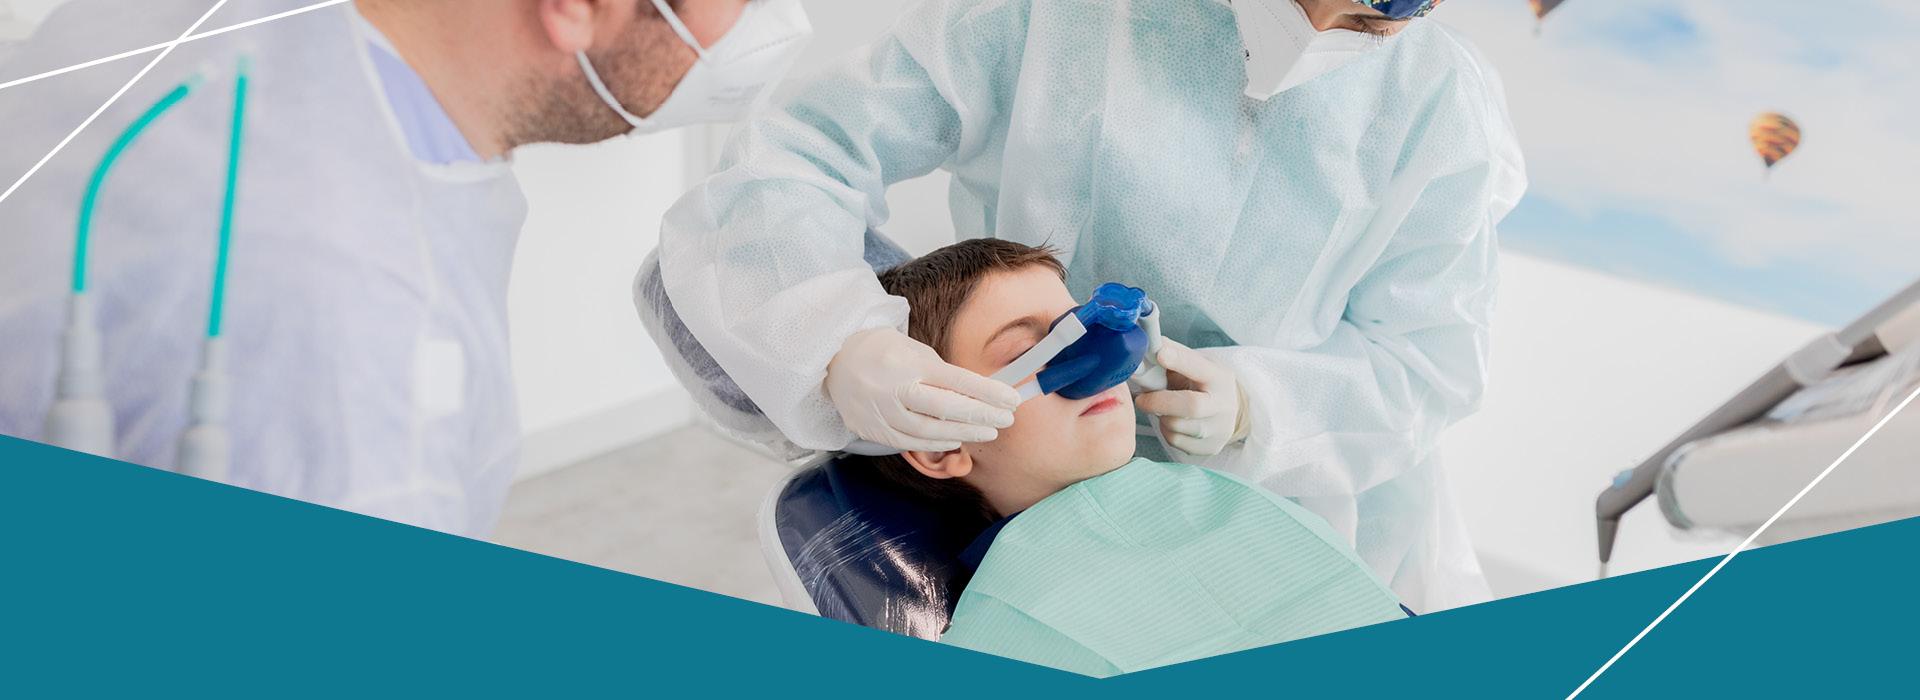 garda-odontoiatria-sedazione-cosciente